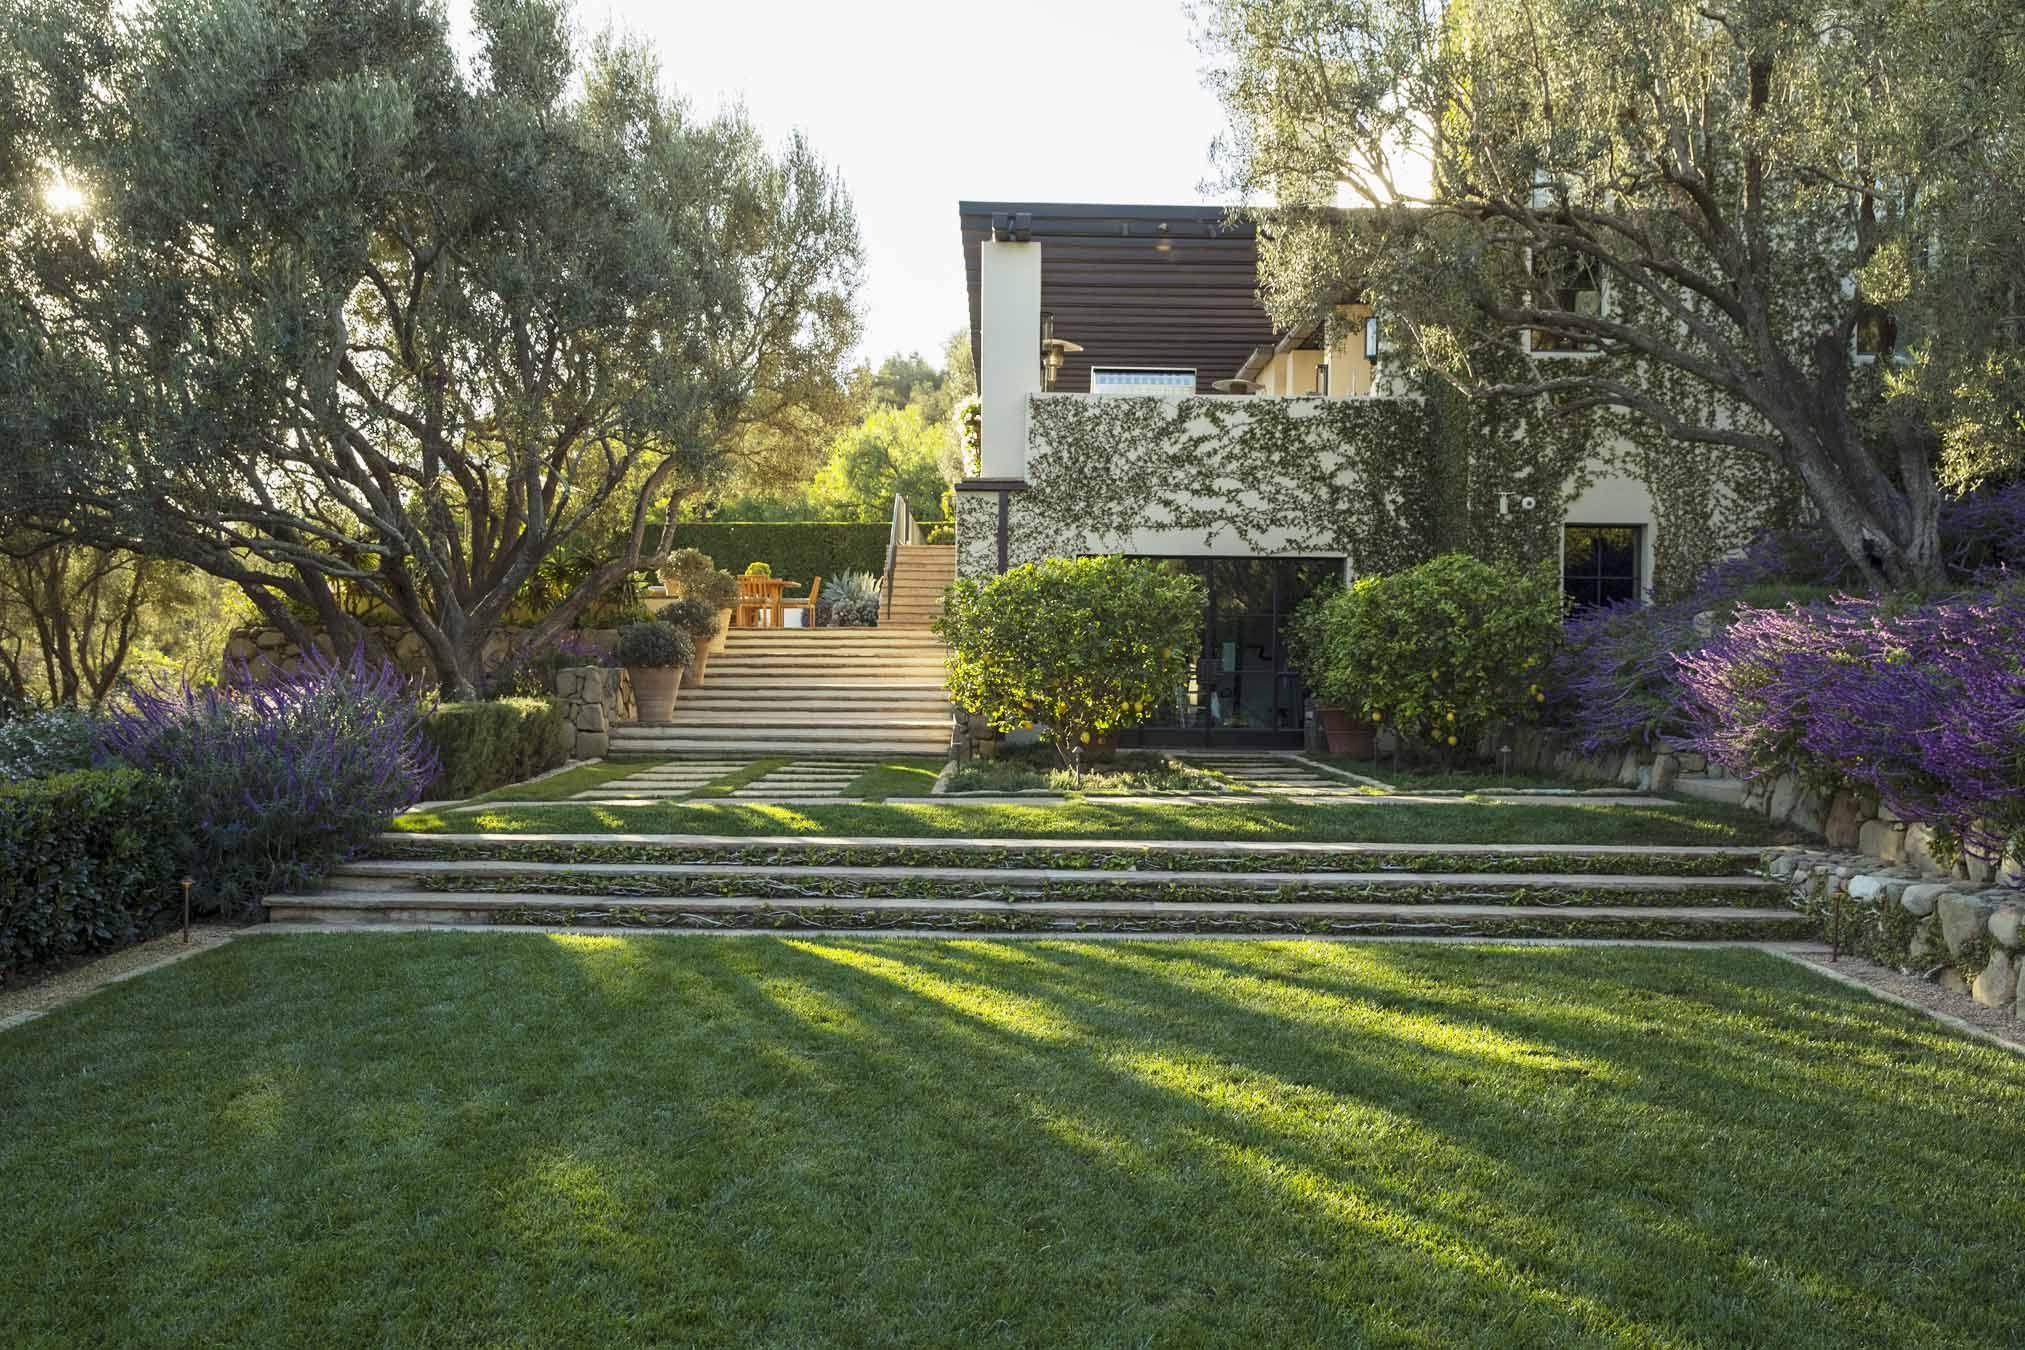 Landscaping Ideas Landscape Designs For Front Yards Backyards